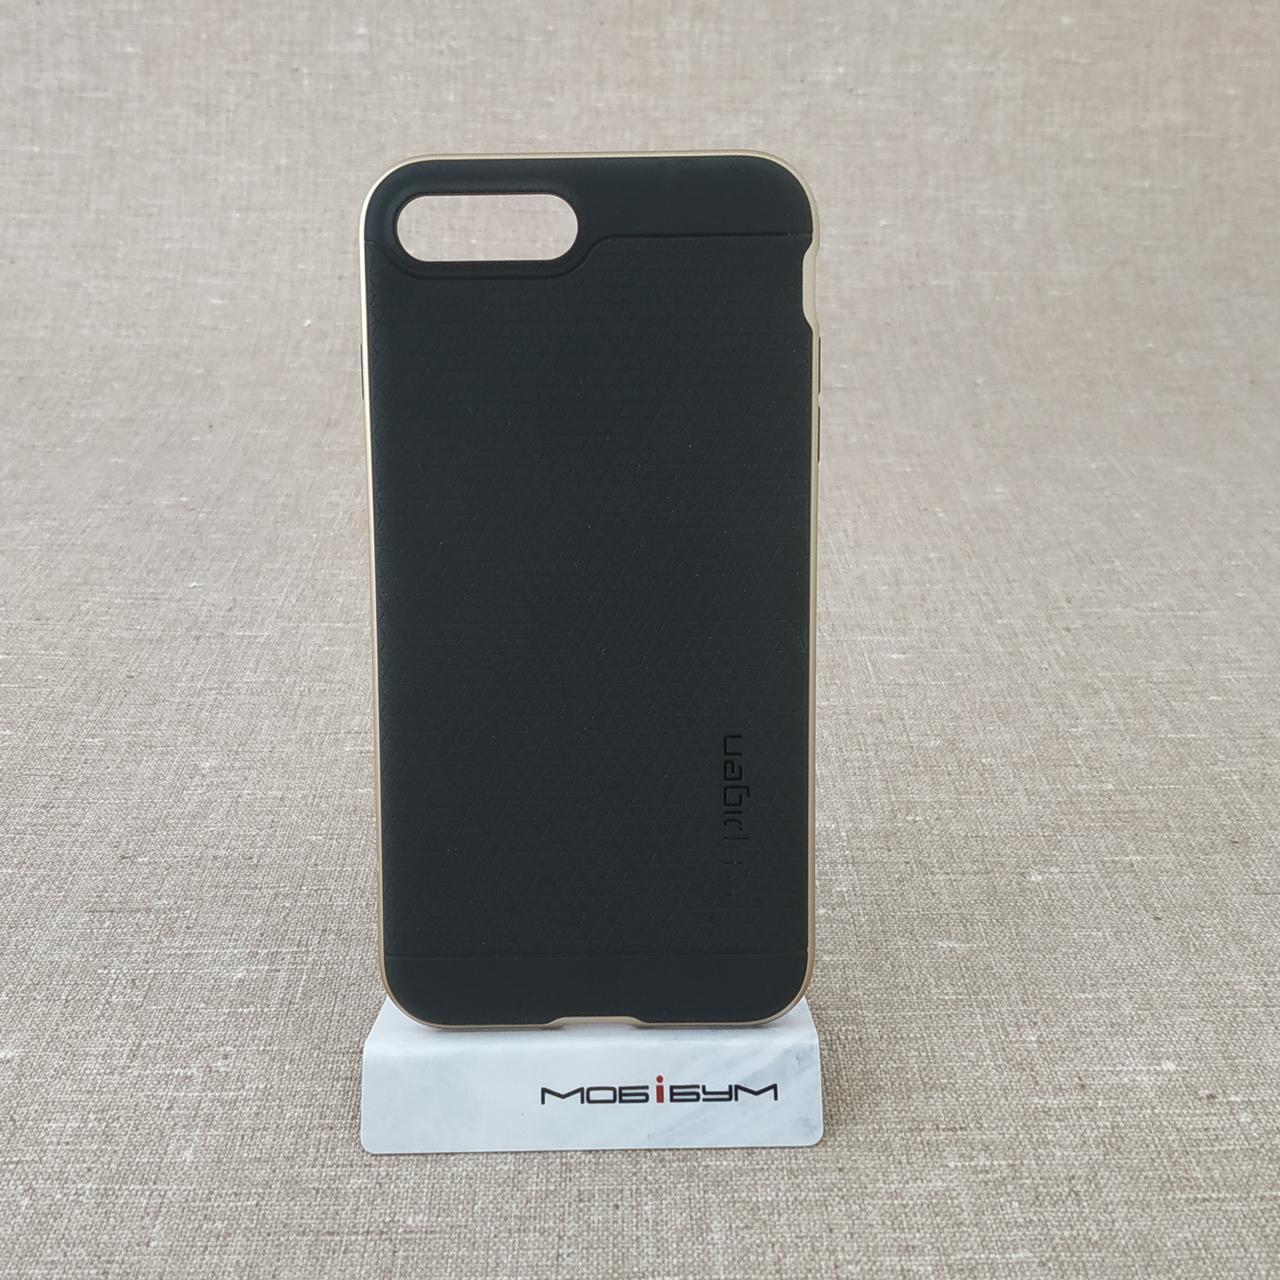 Чехол Spigen Neo Hybrid iPhone 8 Plus/7 Plus shampane gold (43CS20683) EAN/UPC: 8809466647956